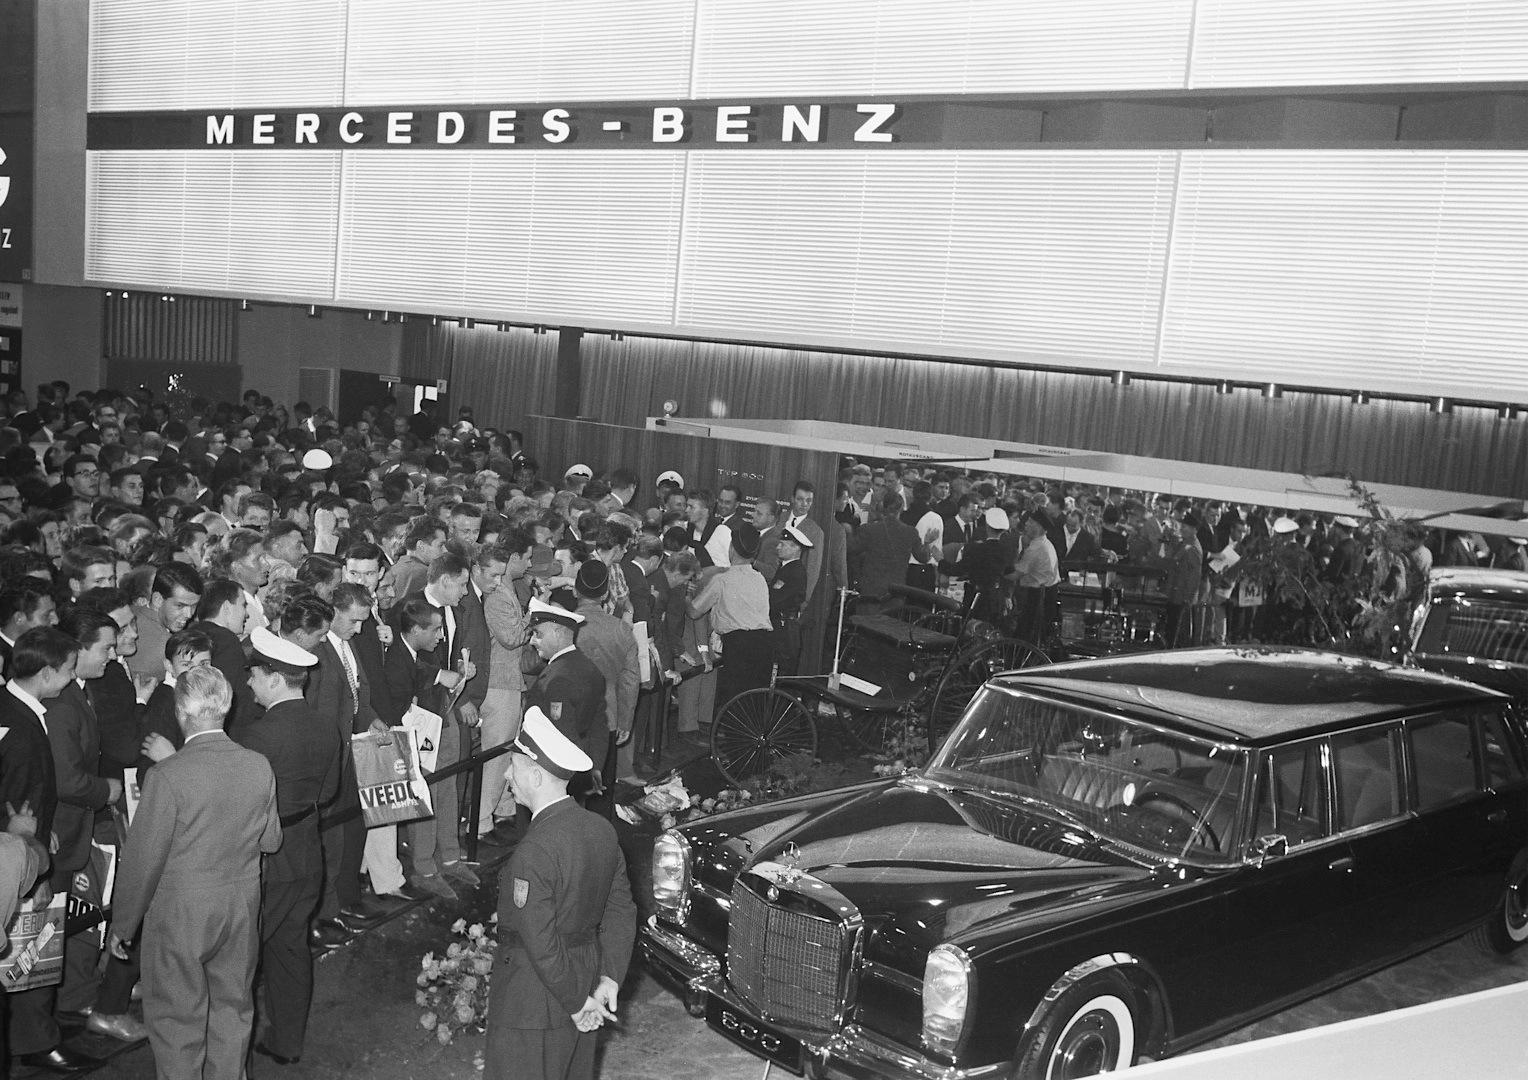 mercedes benz premieres at the frankfurt auto show over. Black Bedroom Furniture Sets. Home Design Ideas